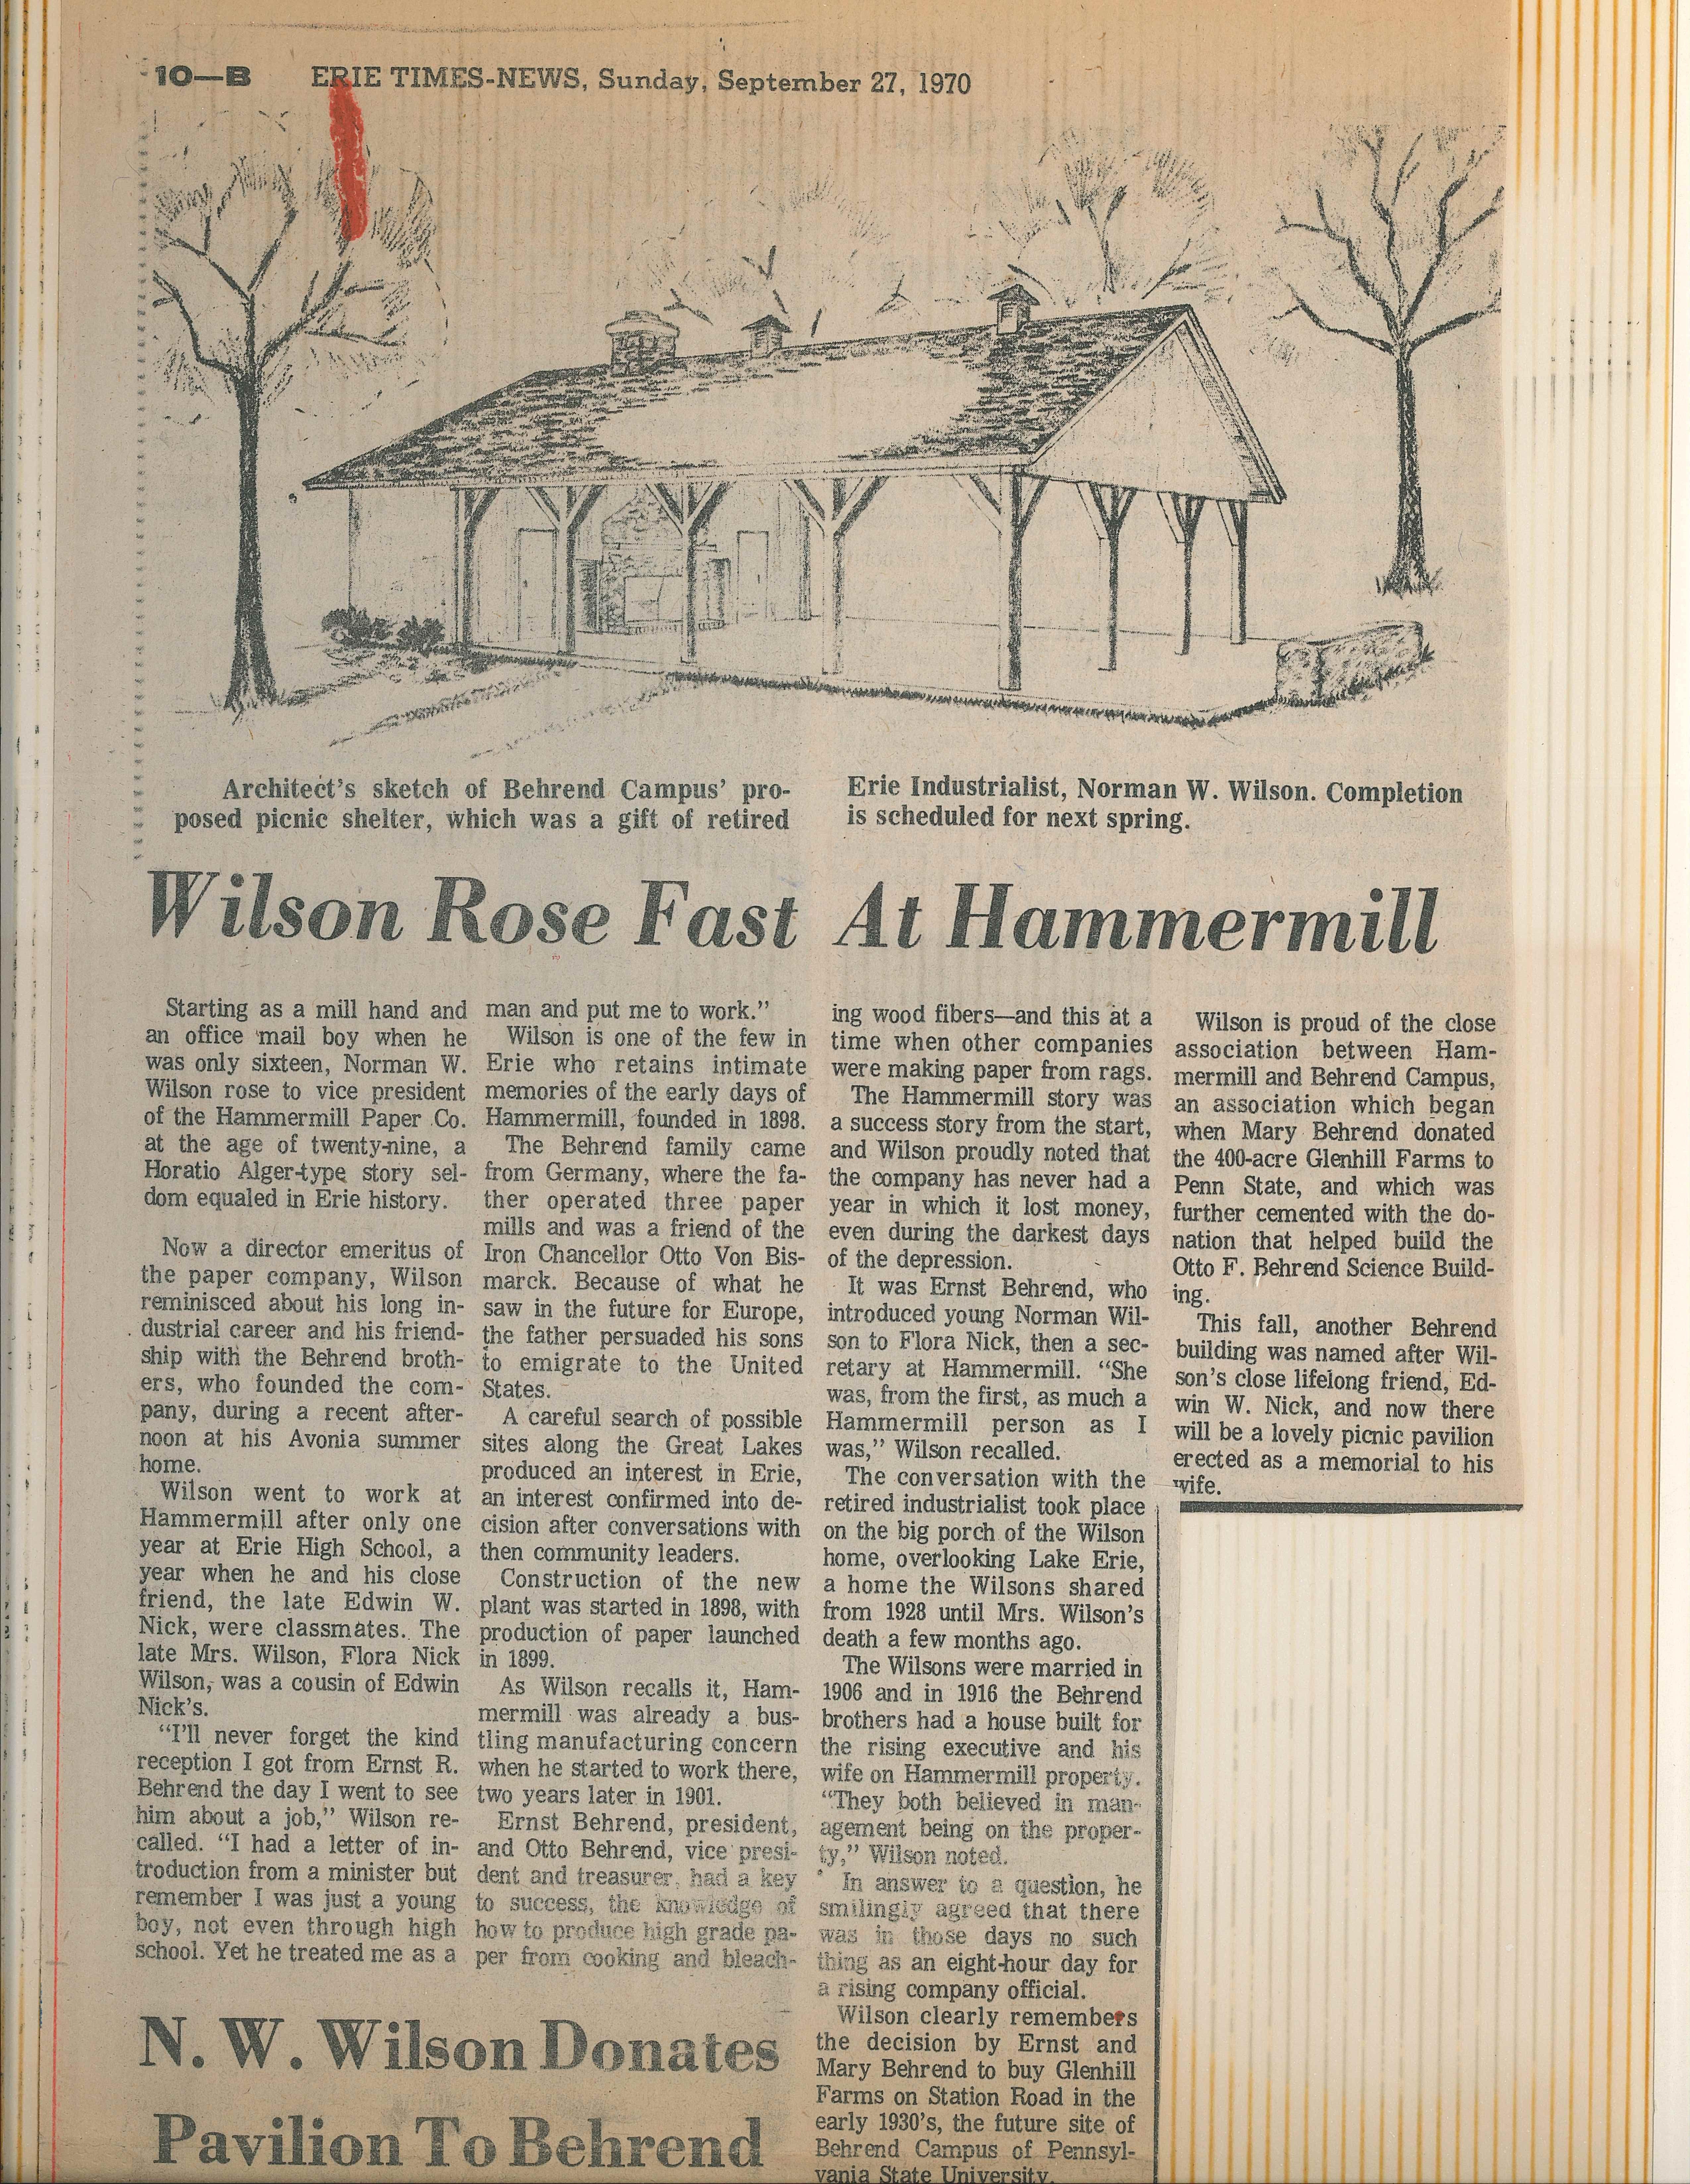 Wilson News story